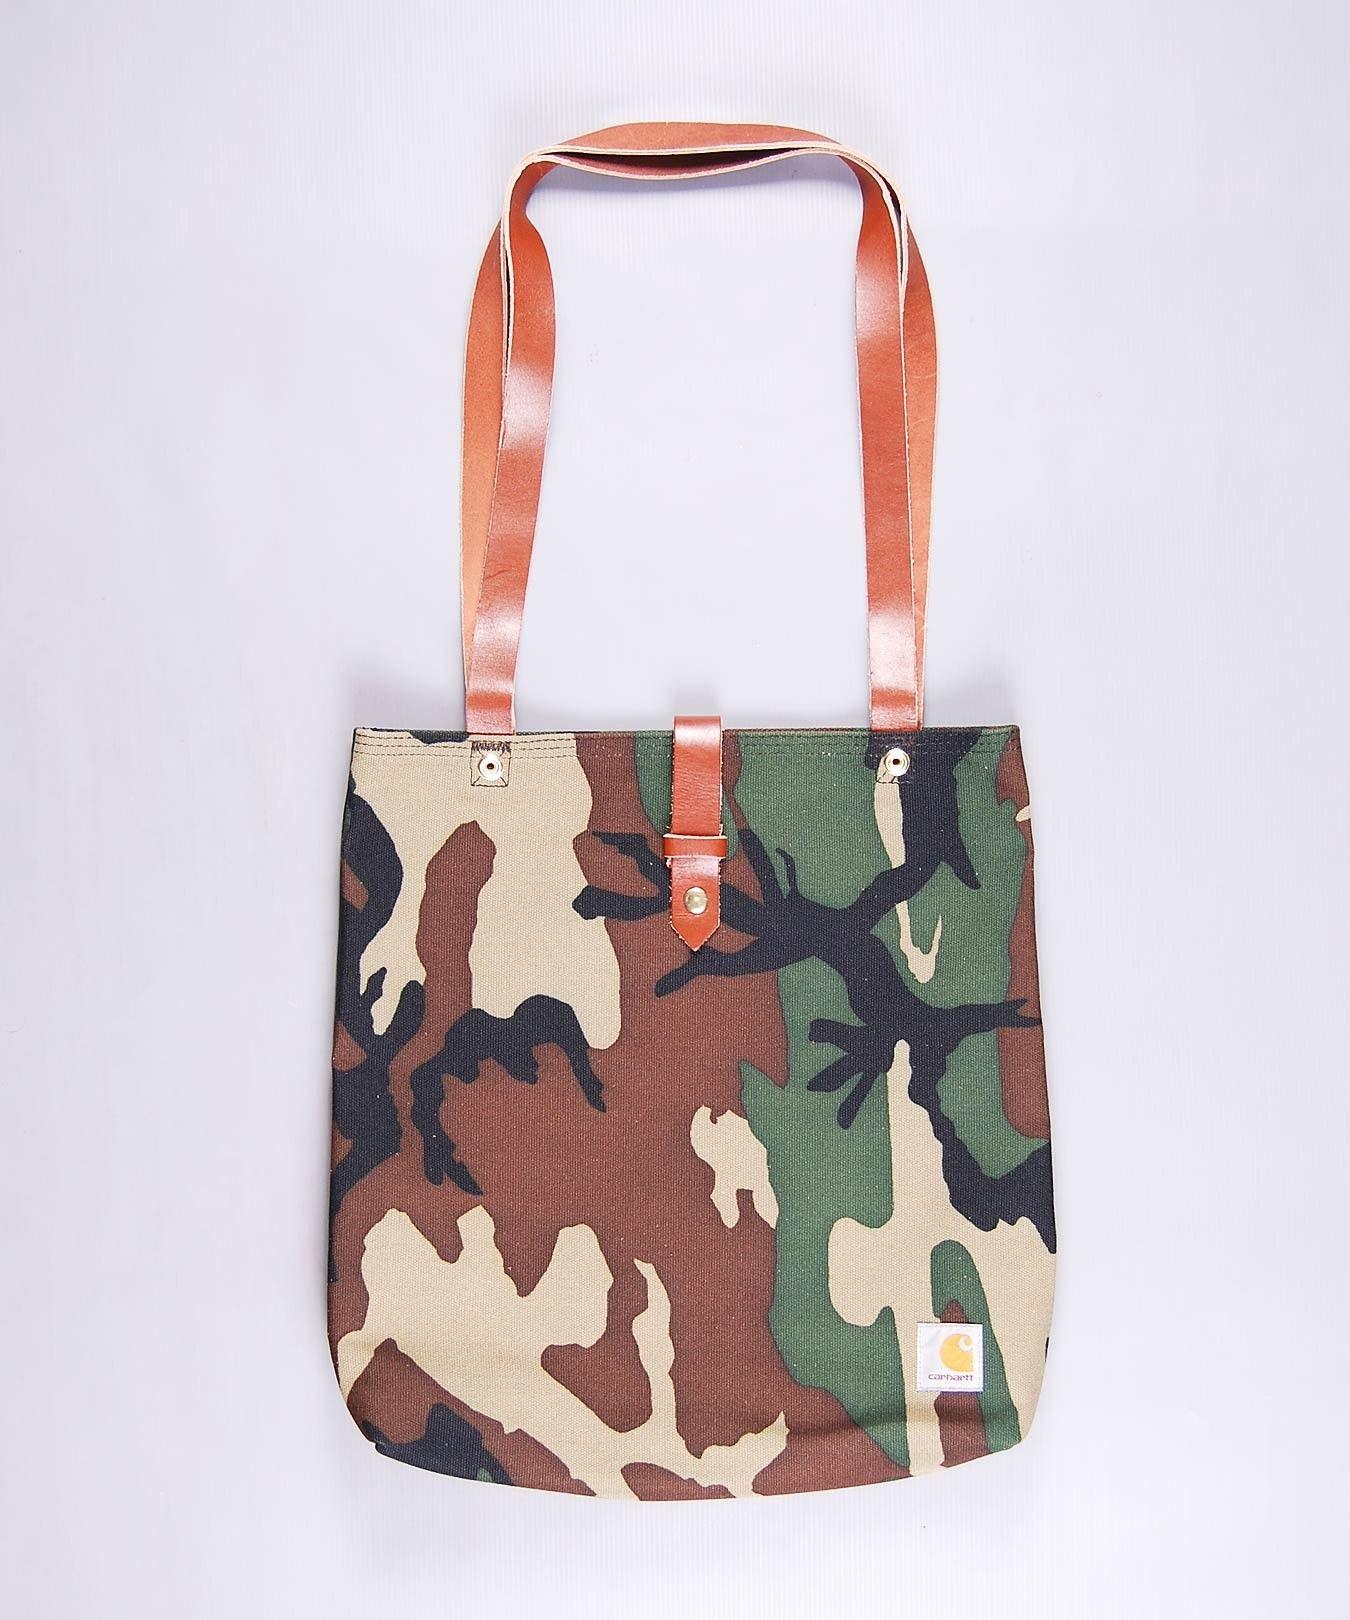 Carhartt at Weavers Door | Carhartt | Bag | Gob Tote Bag | Camo | £ & Carhartt at Weavers Door | Carhartt | Bag | Gob Tote Bag | Camo ... Pezcame.Com